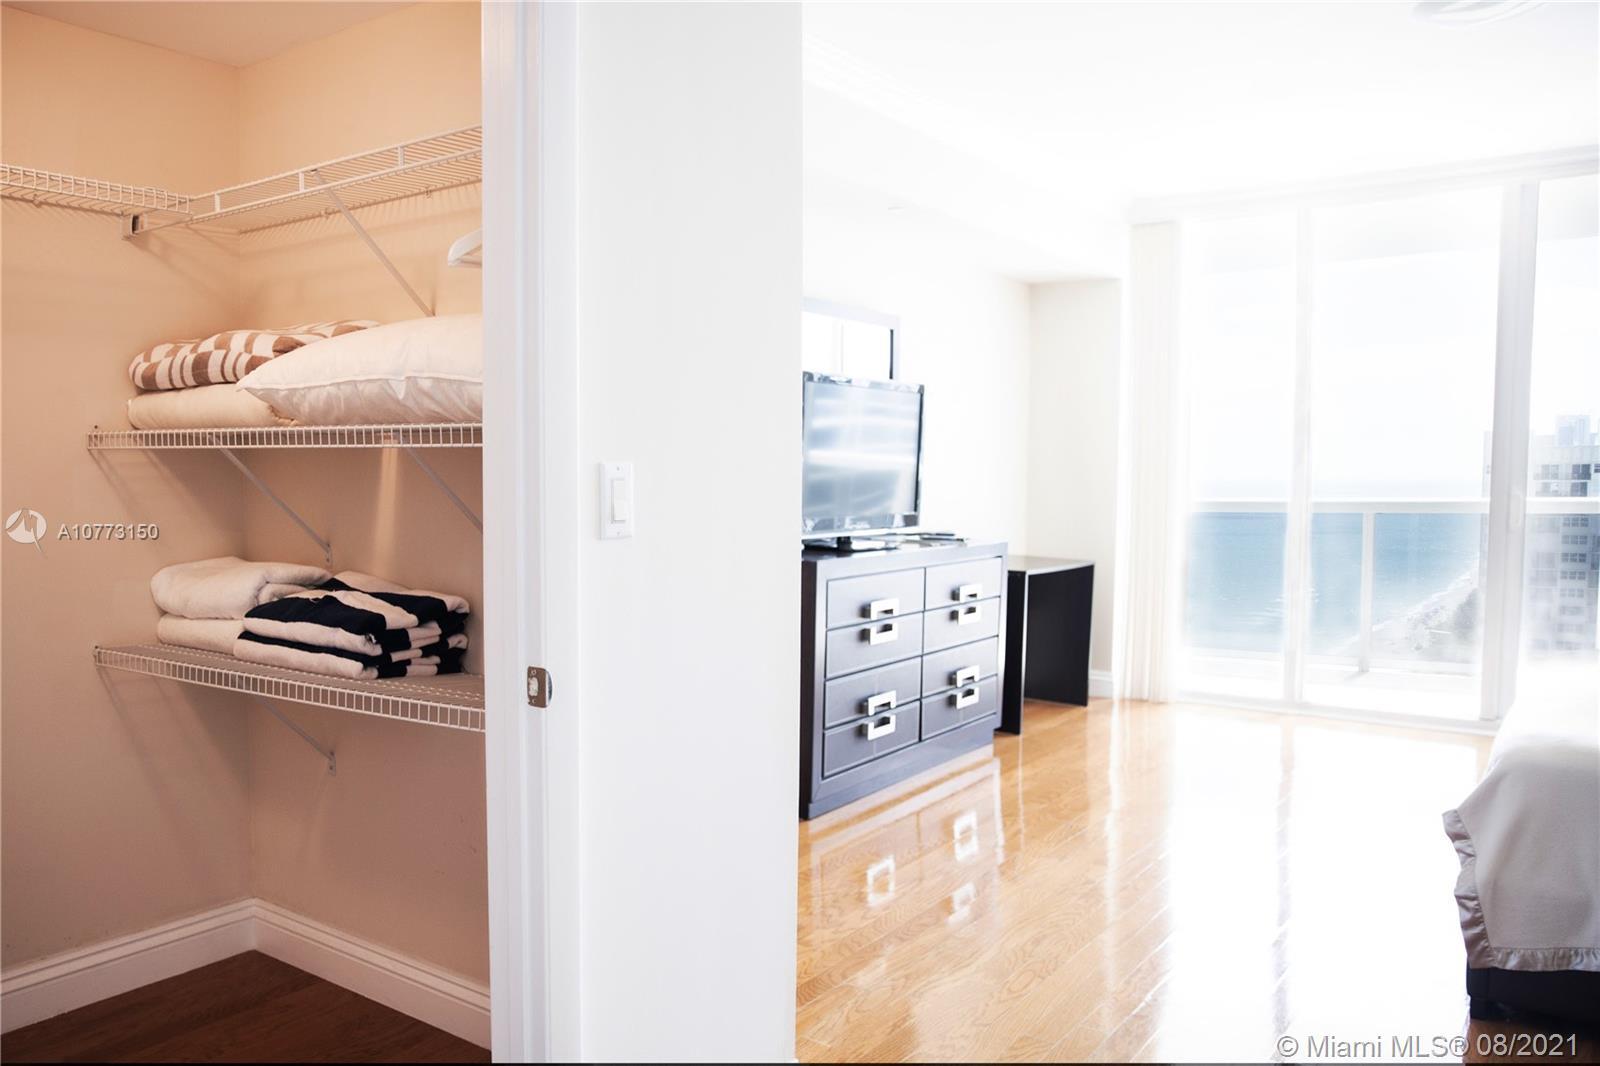 2202 2 / 3 2065 sq. ft. $ 2019-11-14 0 Photo